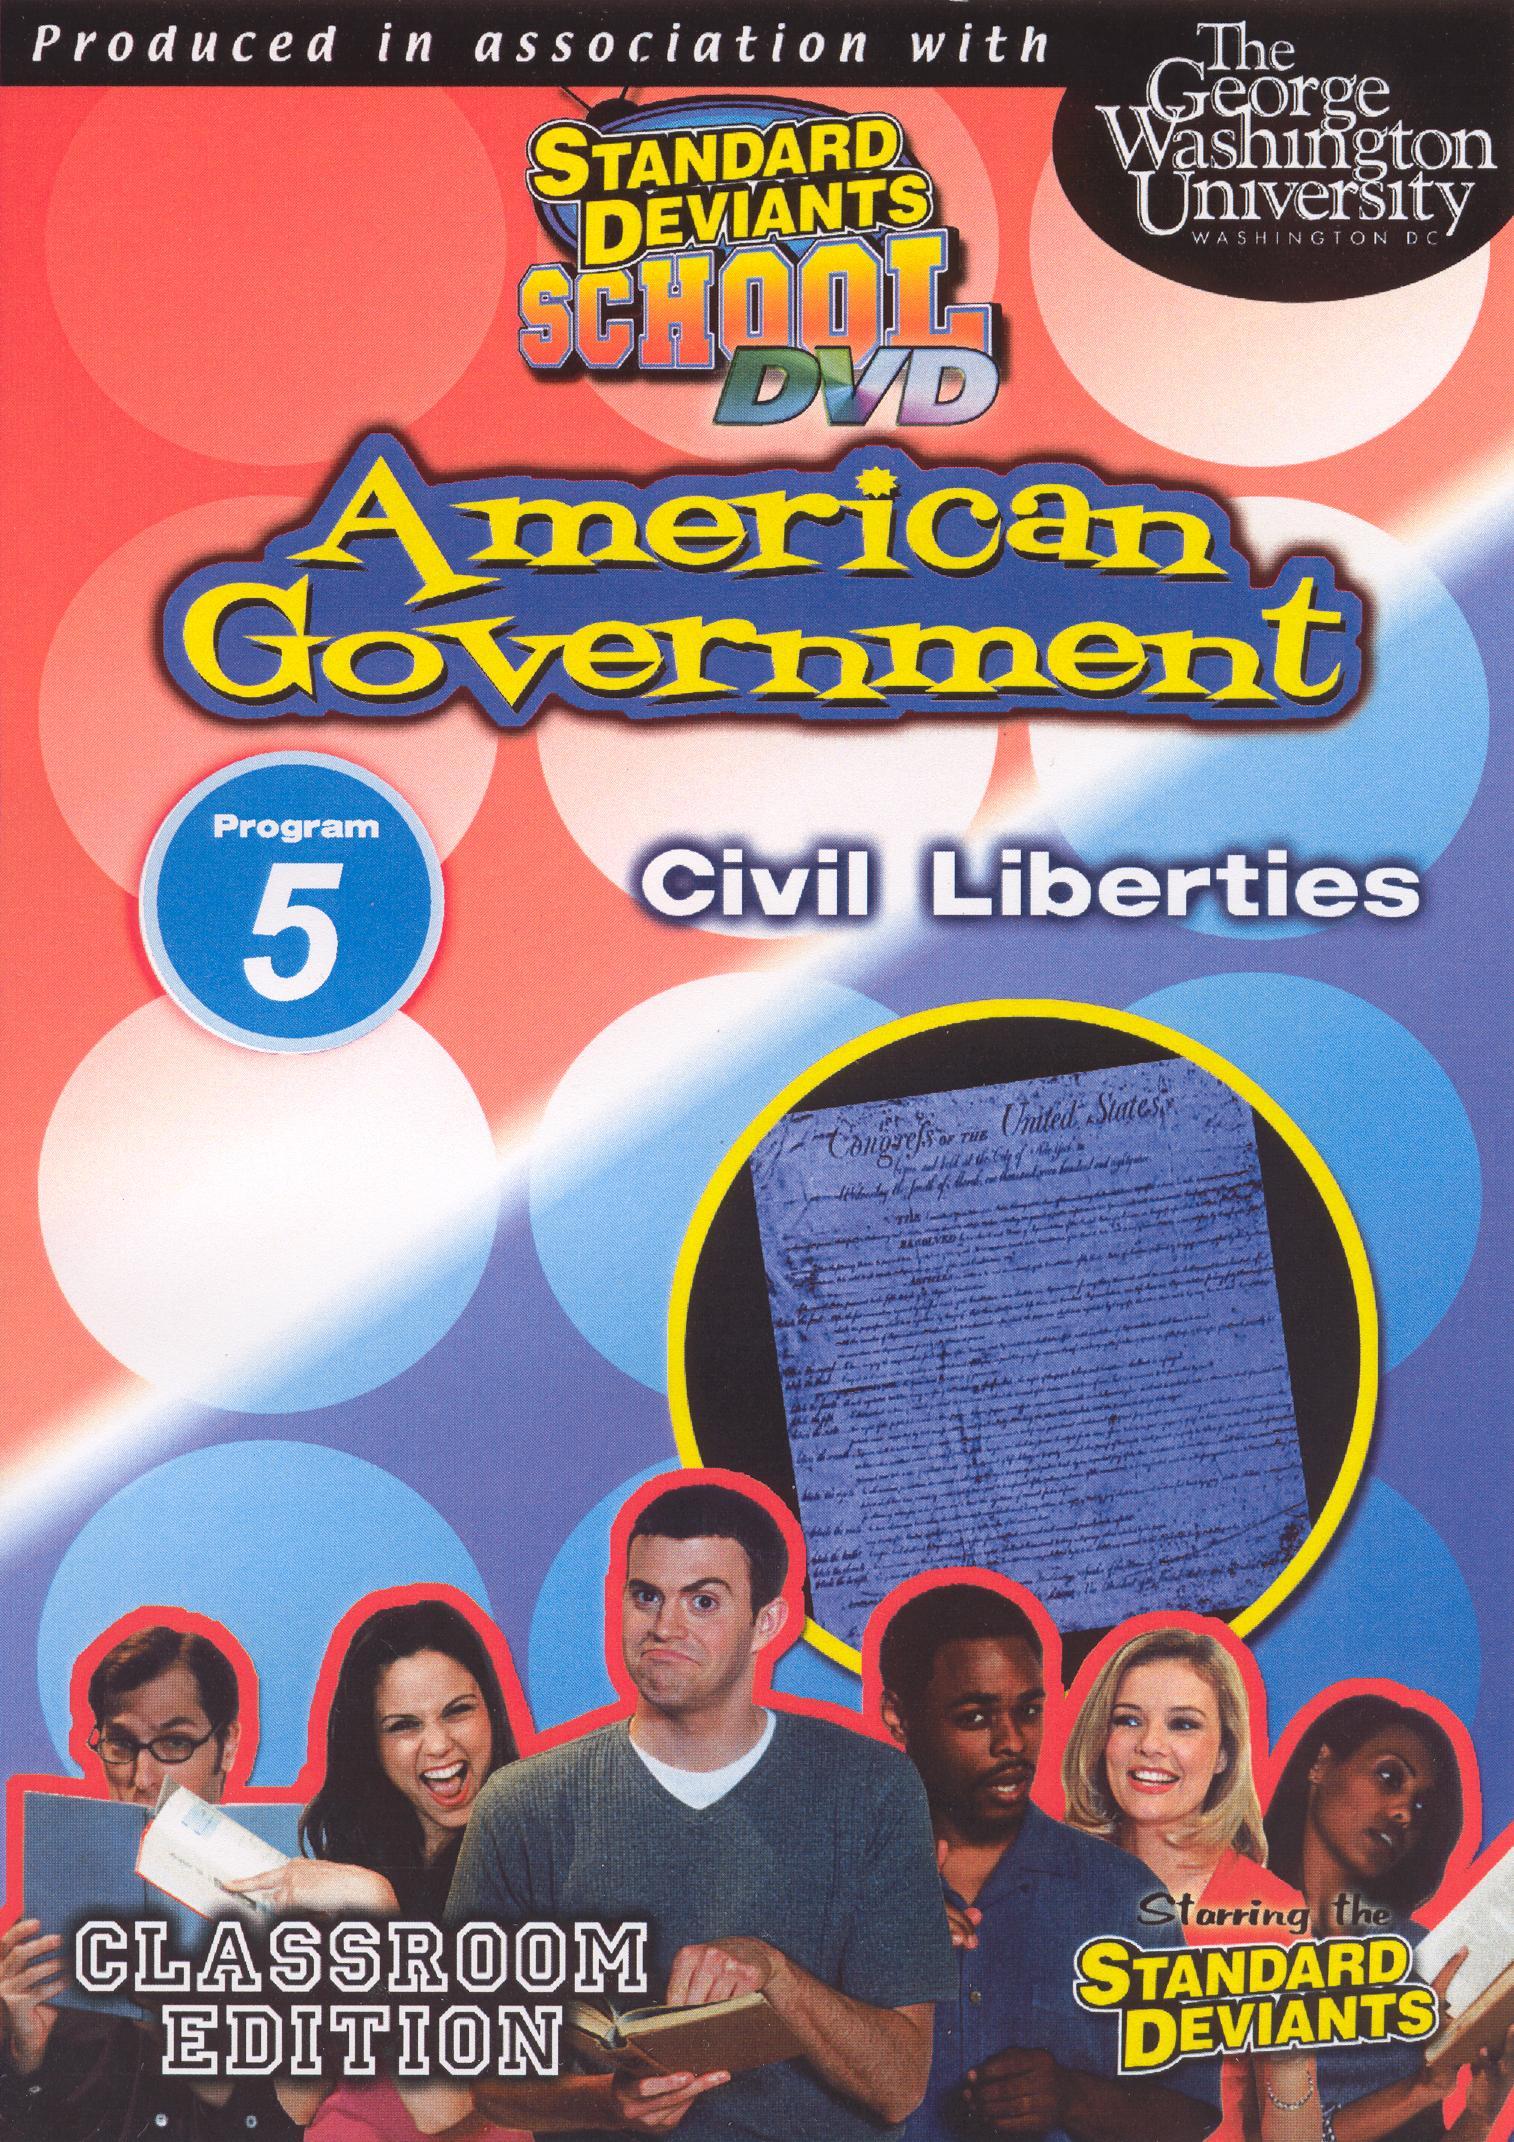 Standard Deviants School: American Government, Module 5 - Civil Liberties